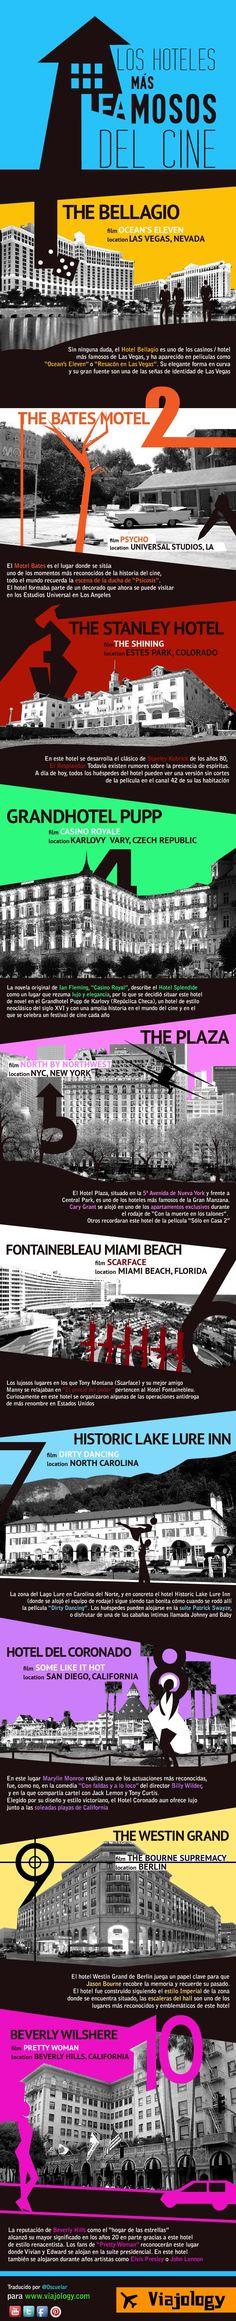 Hoteles famosos | Famous hotels